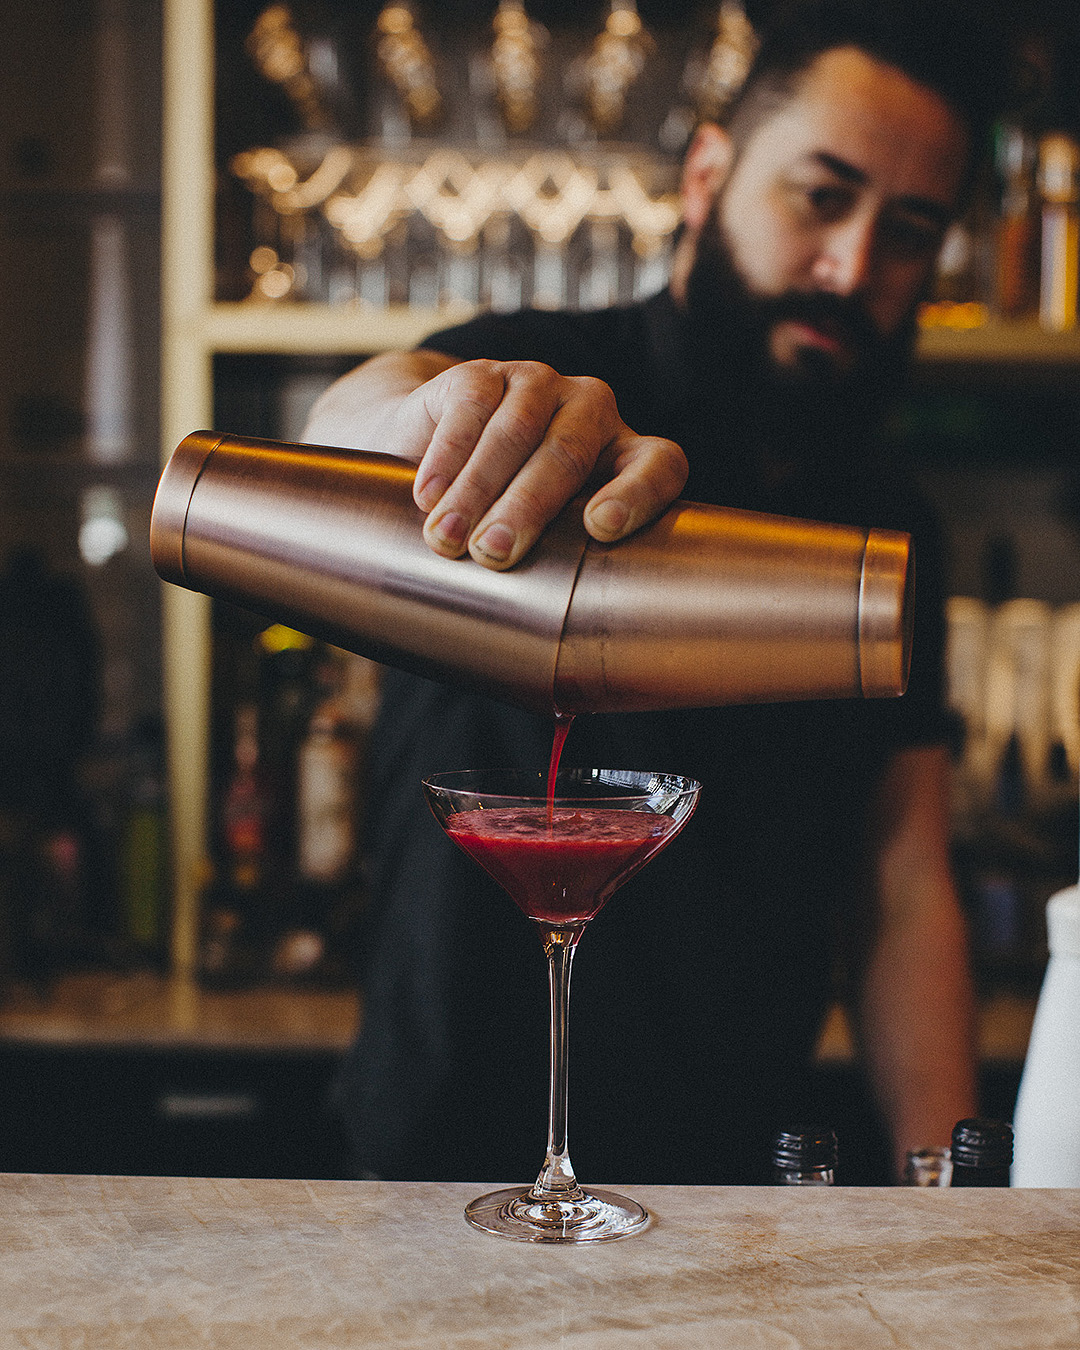 A bartender prepares a drink with panache at Little Culprit.